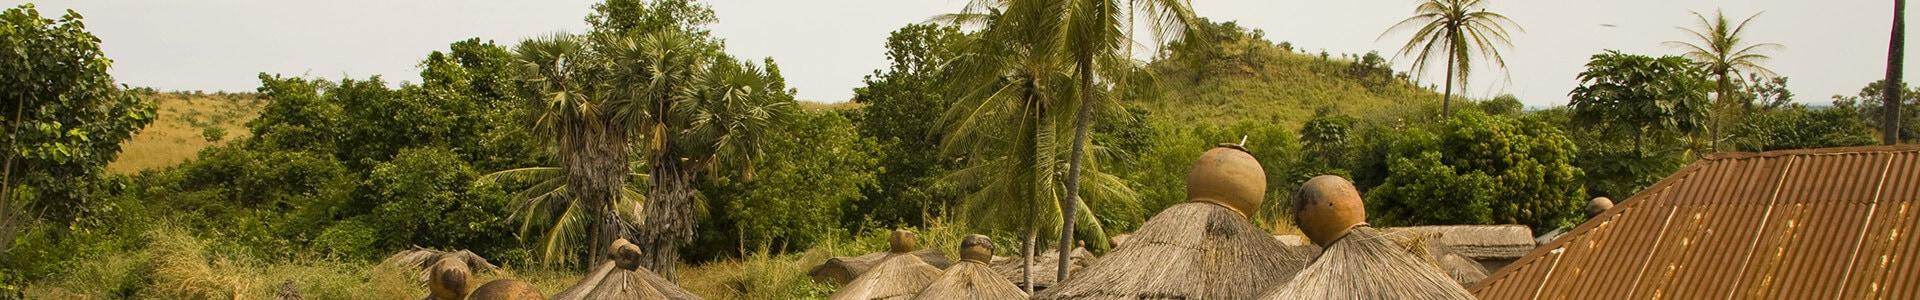 Voyage au Togo - TUI